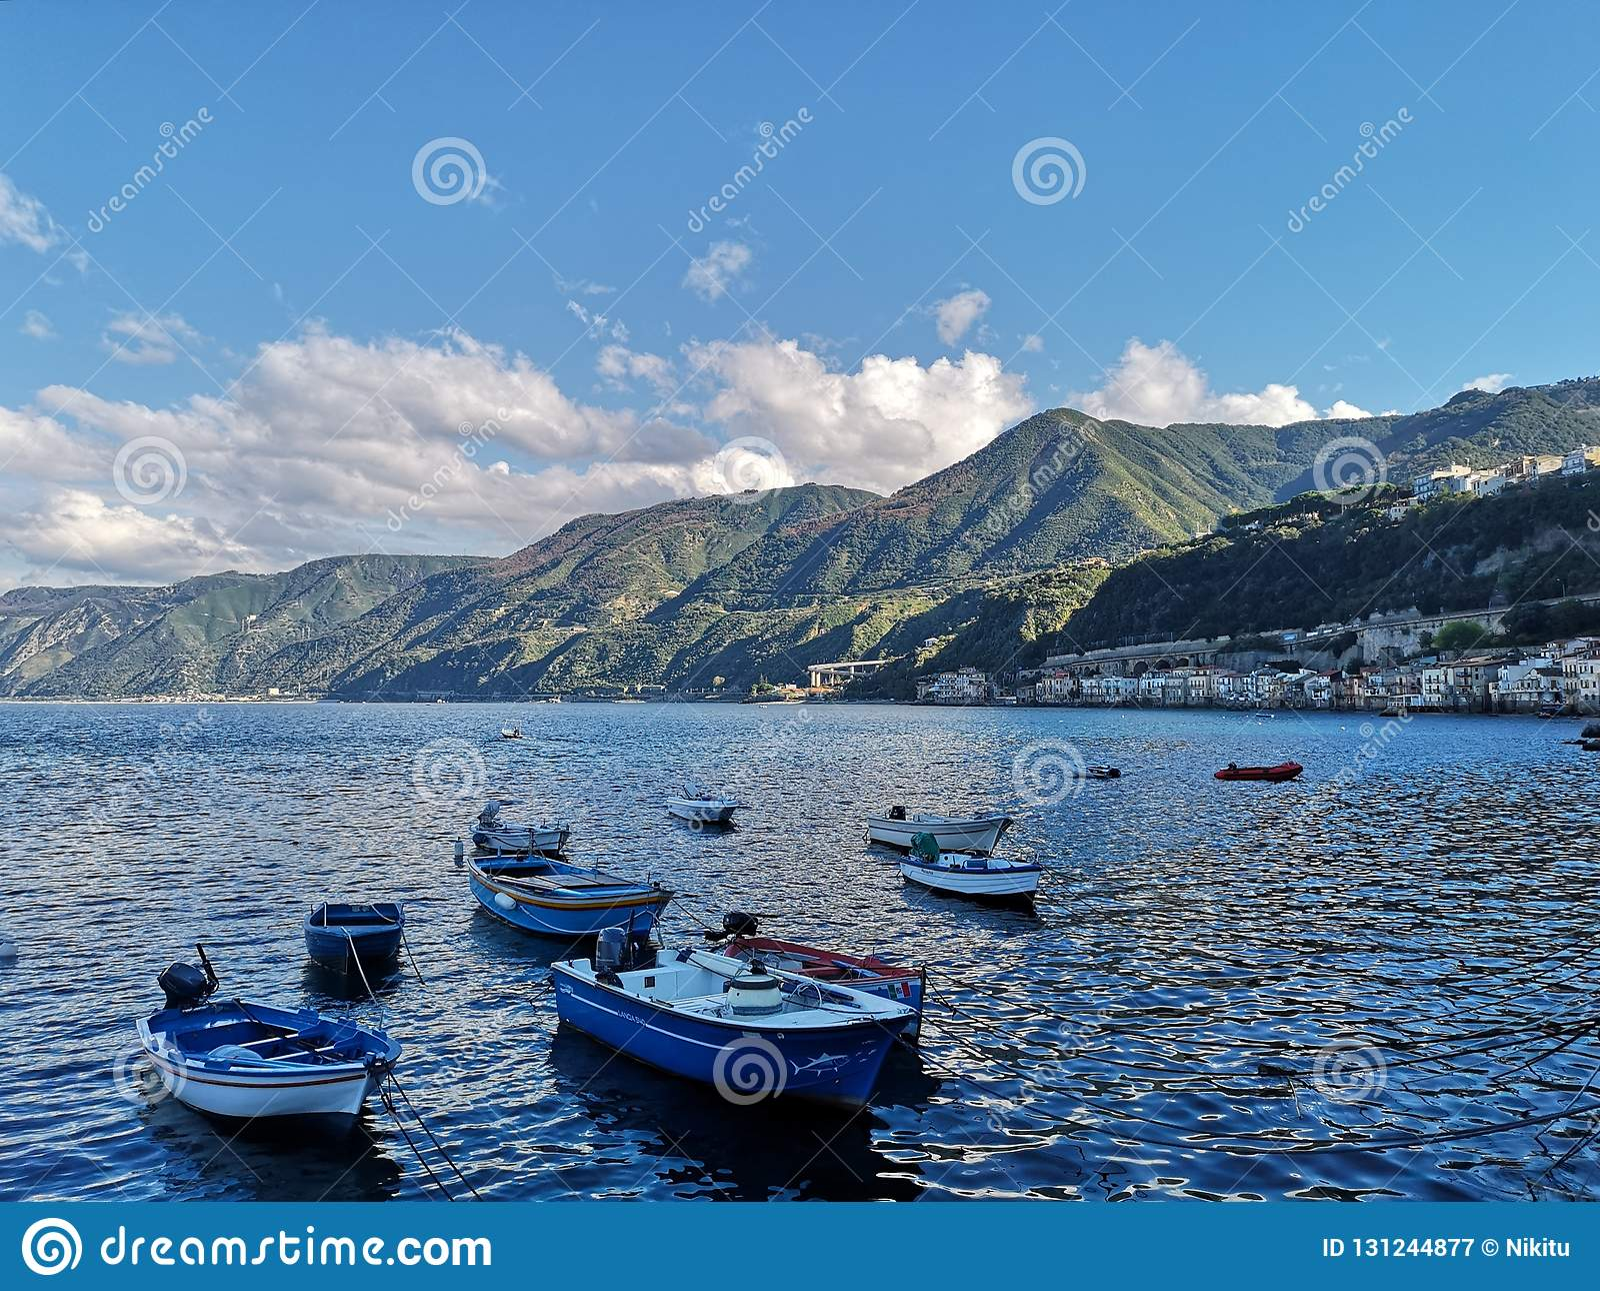 Old fishing village of Scilla